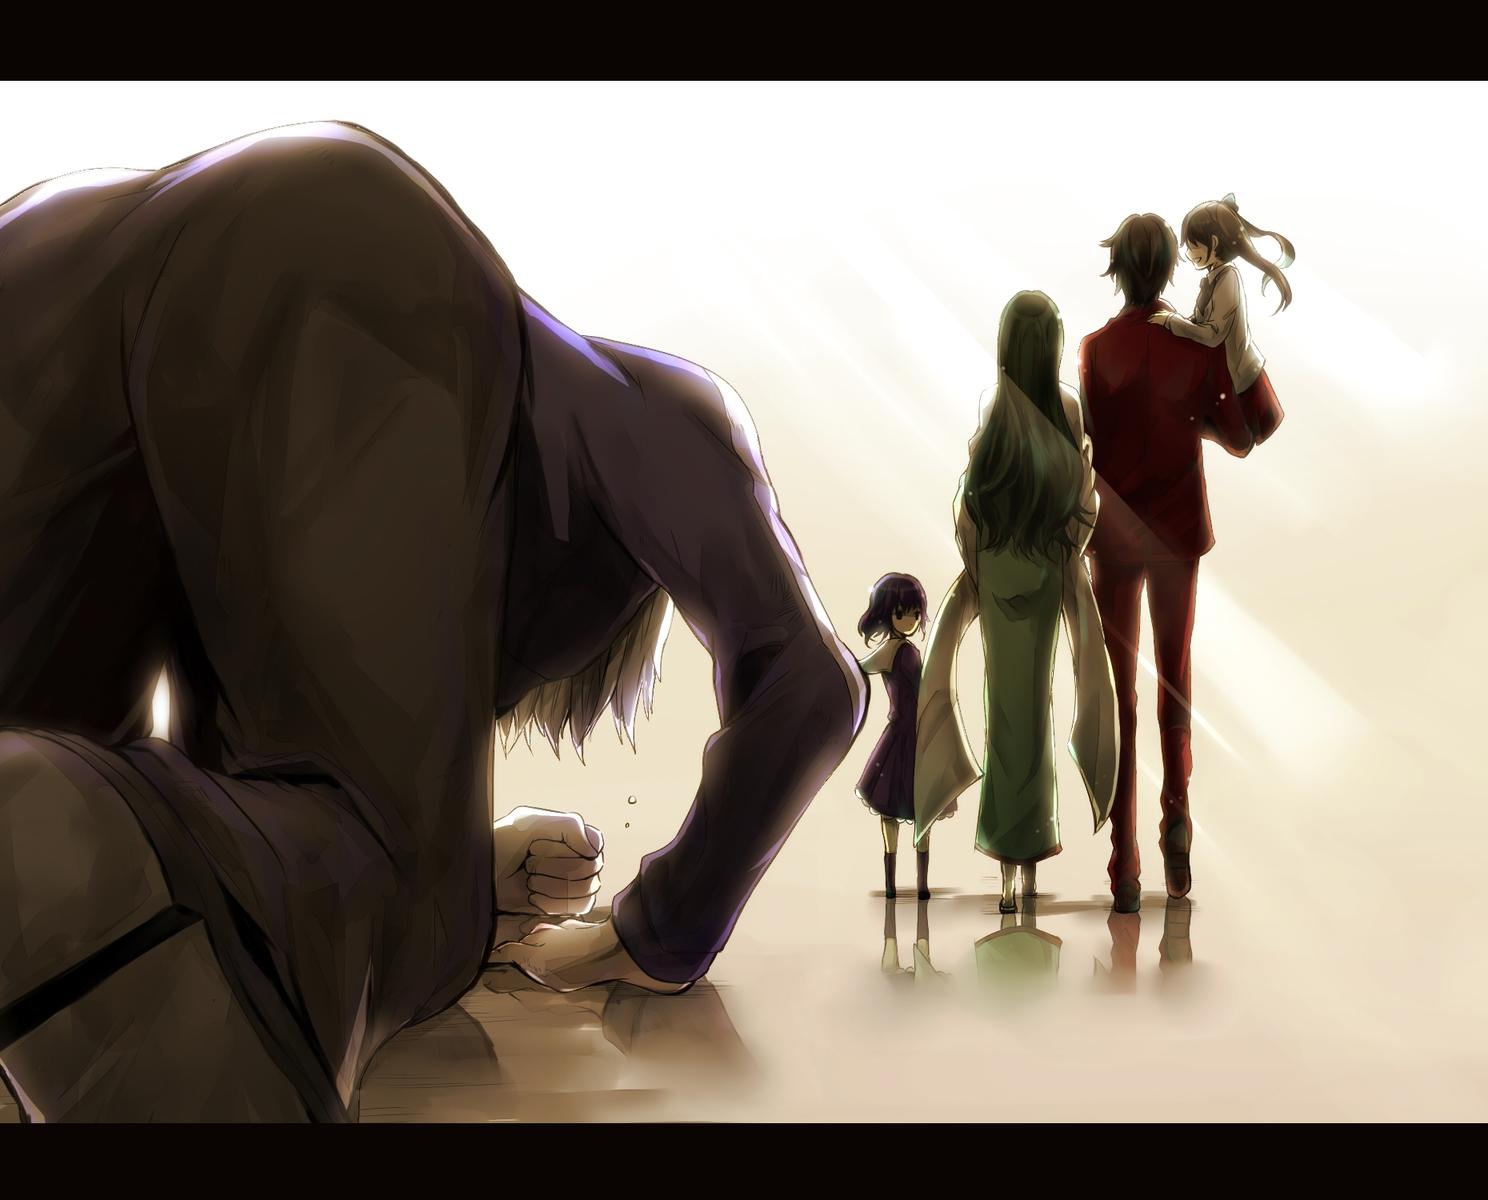 fate_(series) fate/stay_night fate/zero matou_kariya matou_sakura supika_(piyuki0911) tohsaka_aoi tohsaka_rin tohsaka_tokiomi